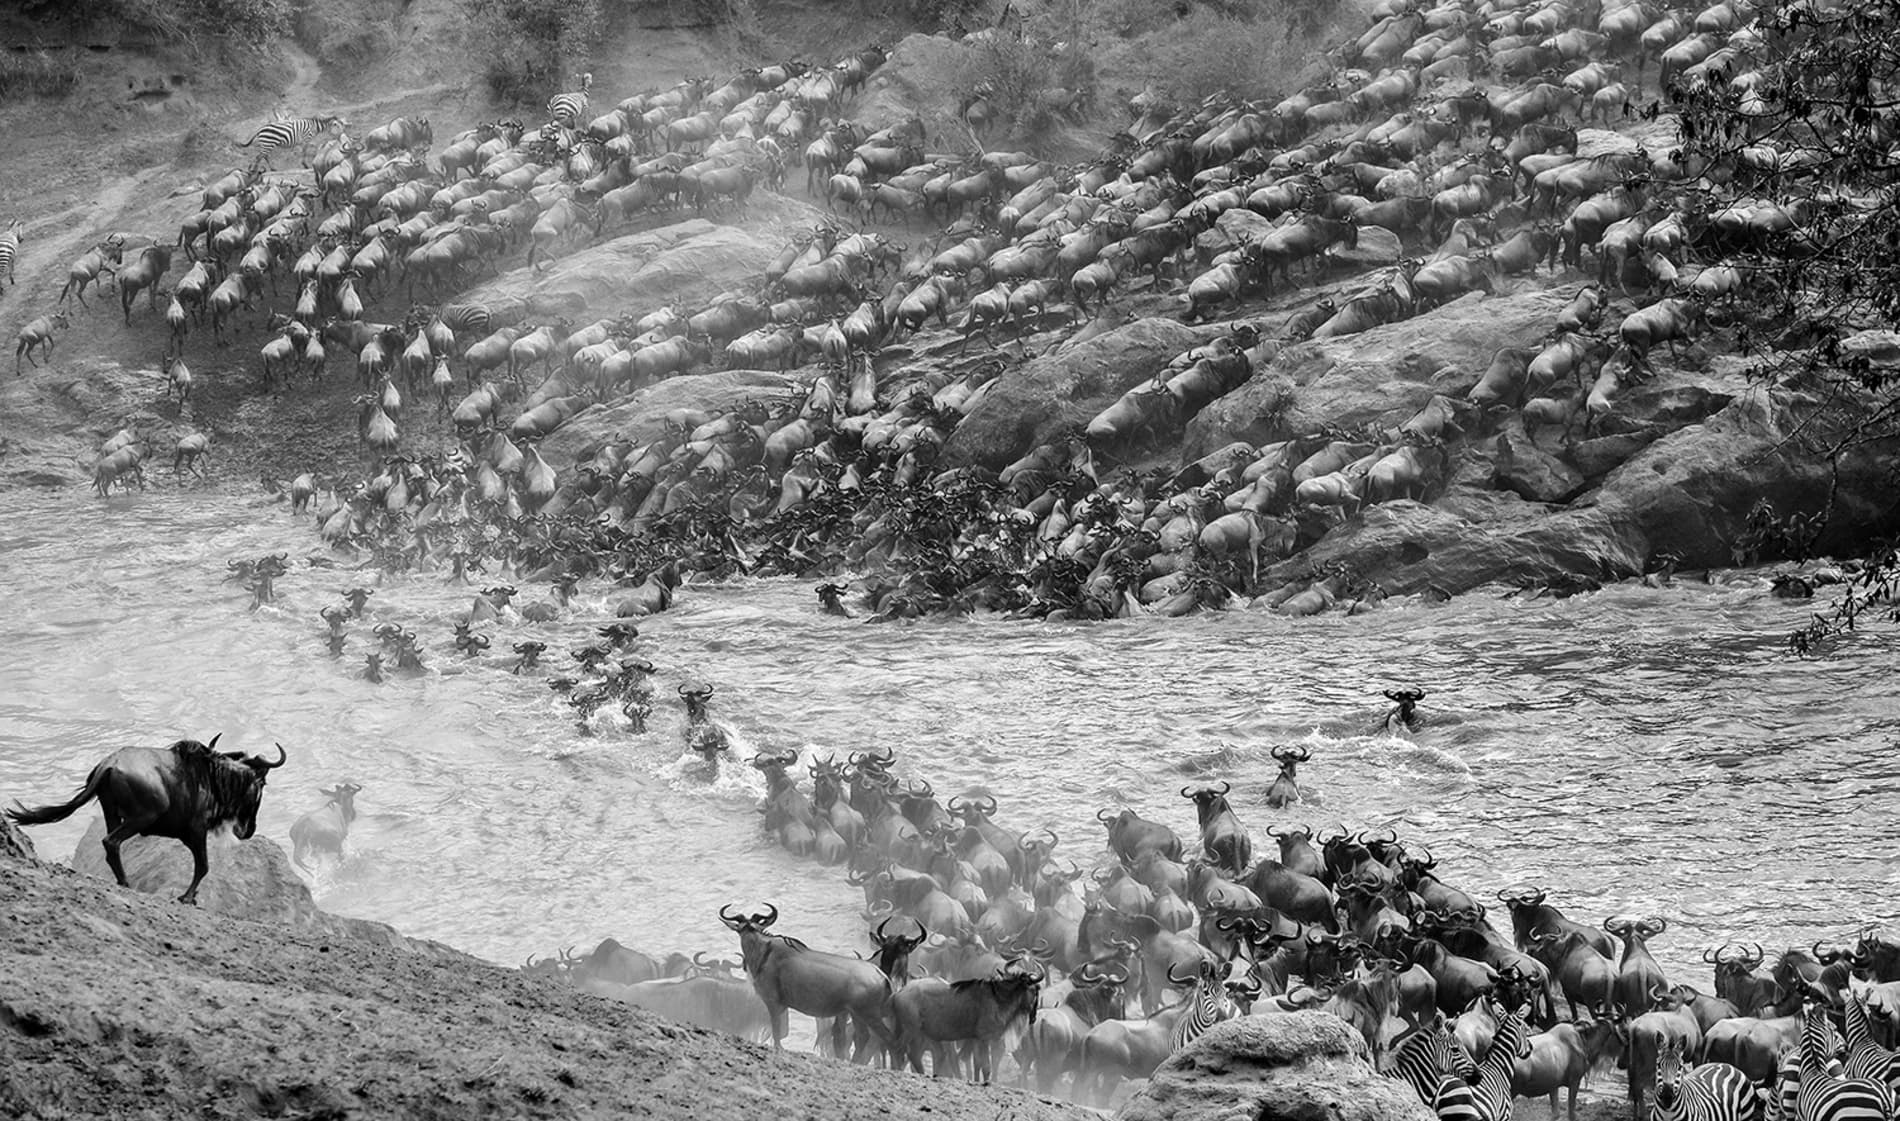 The great Wildebeests Migration